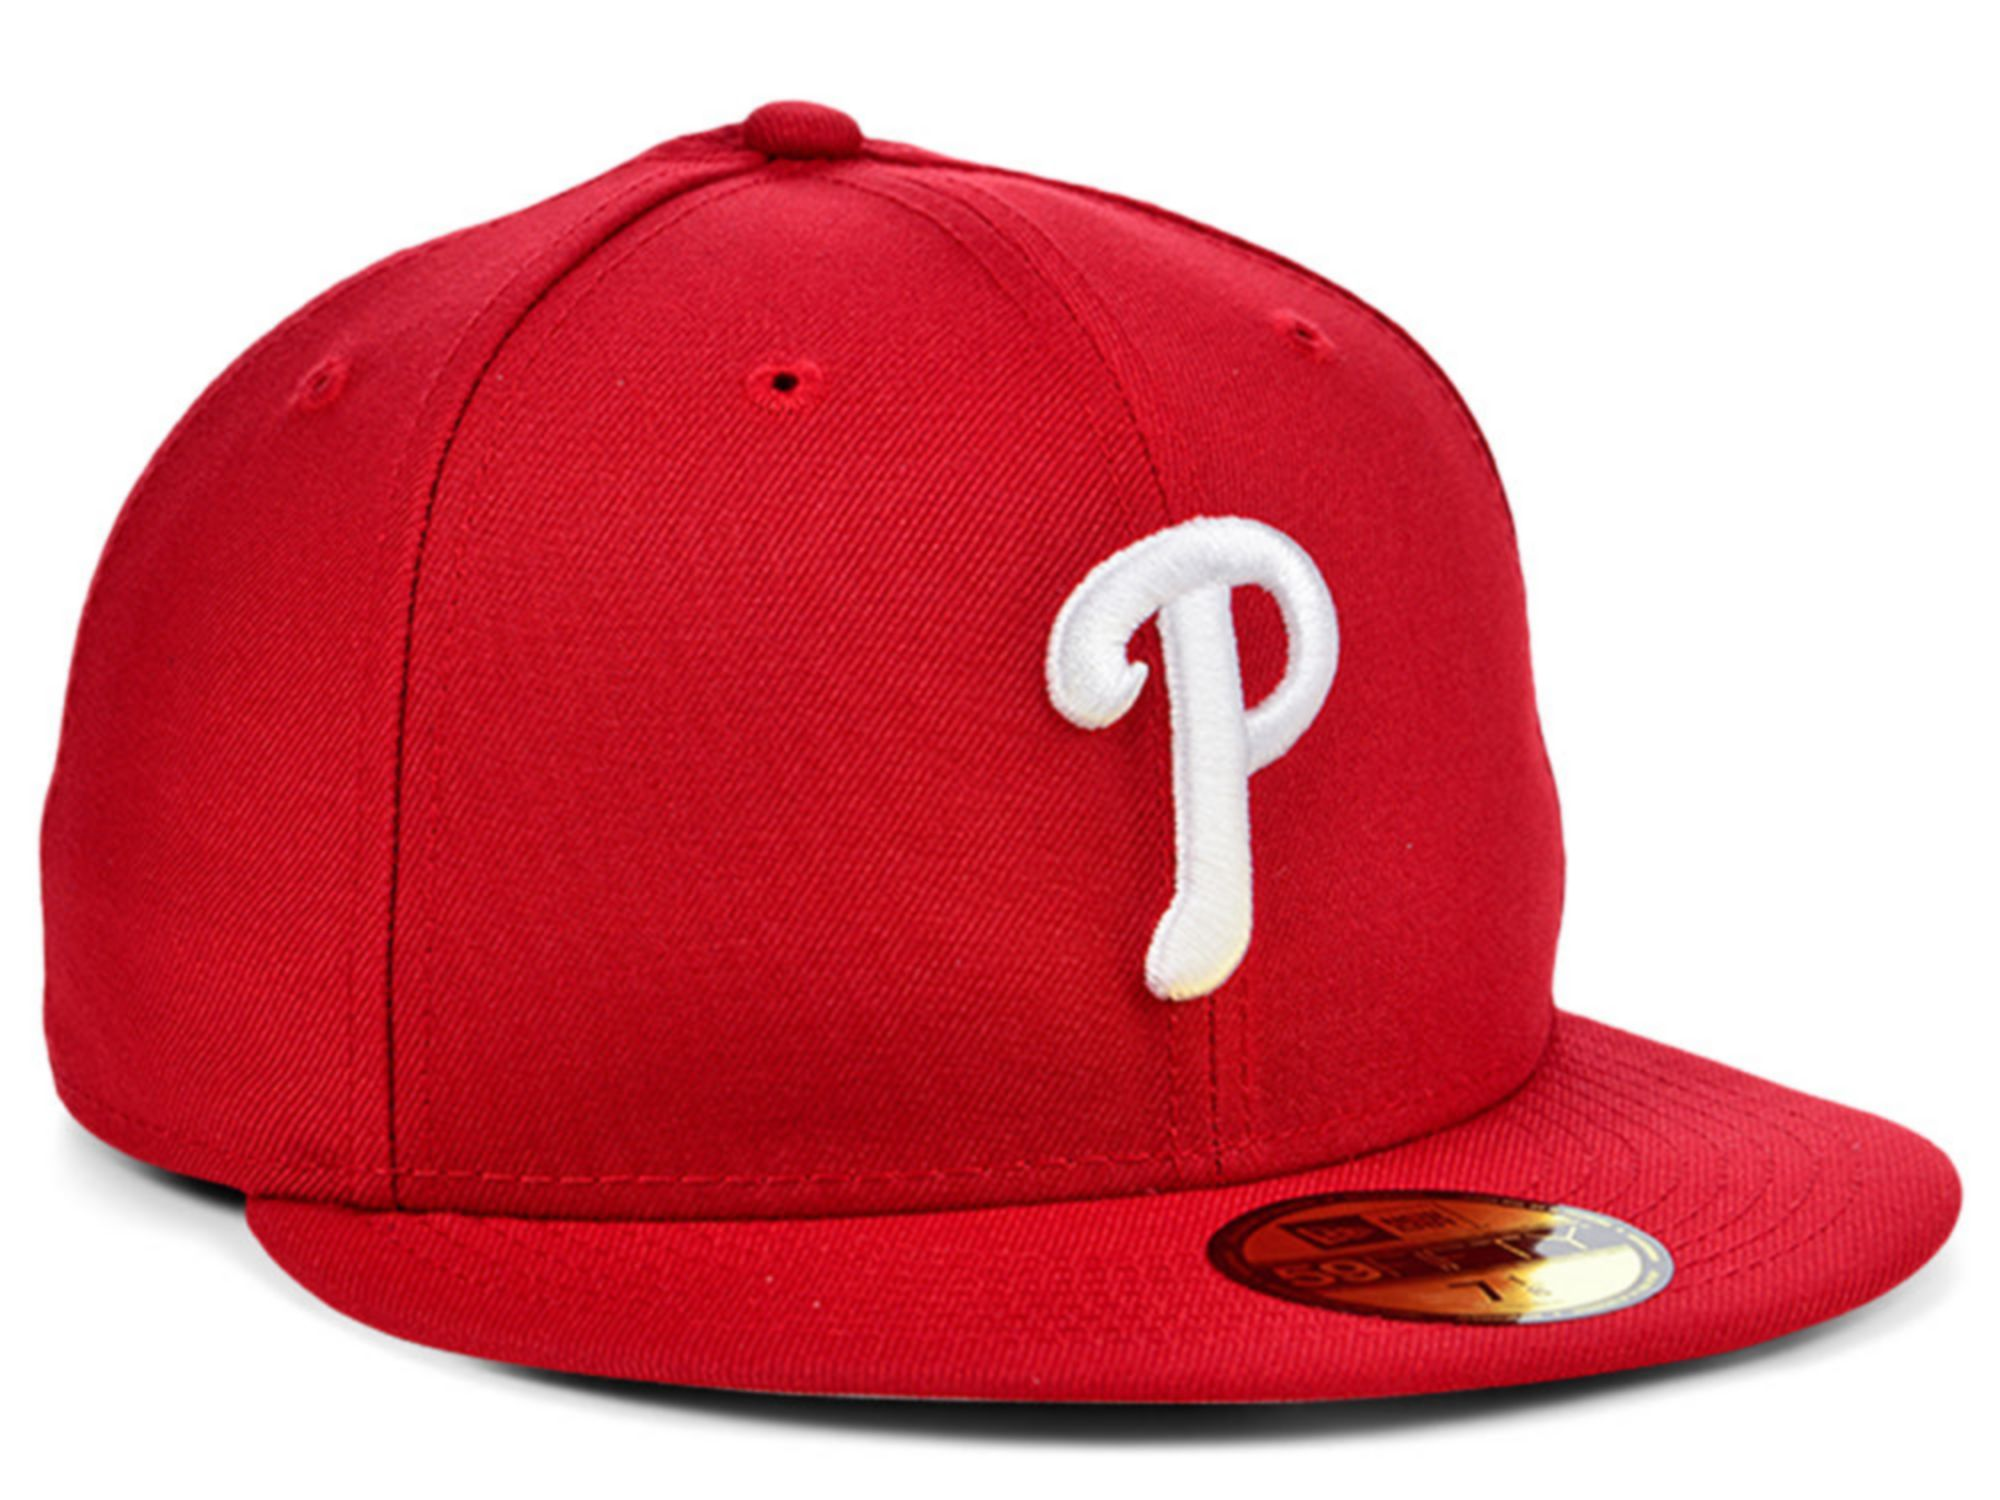 New Era Philadelphia Phillies World Series Patch 59FIFTY Cap & Reviews - MLB - Sports Fan Shop - Macy's